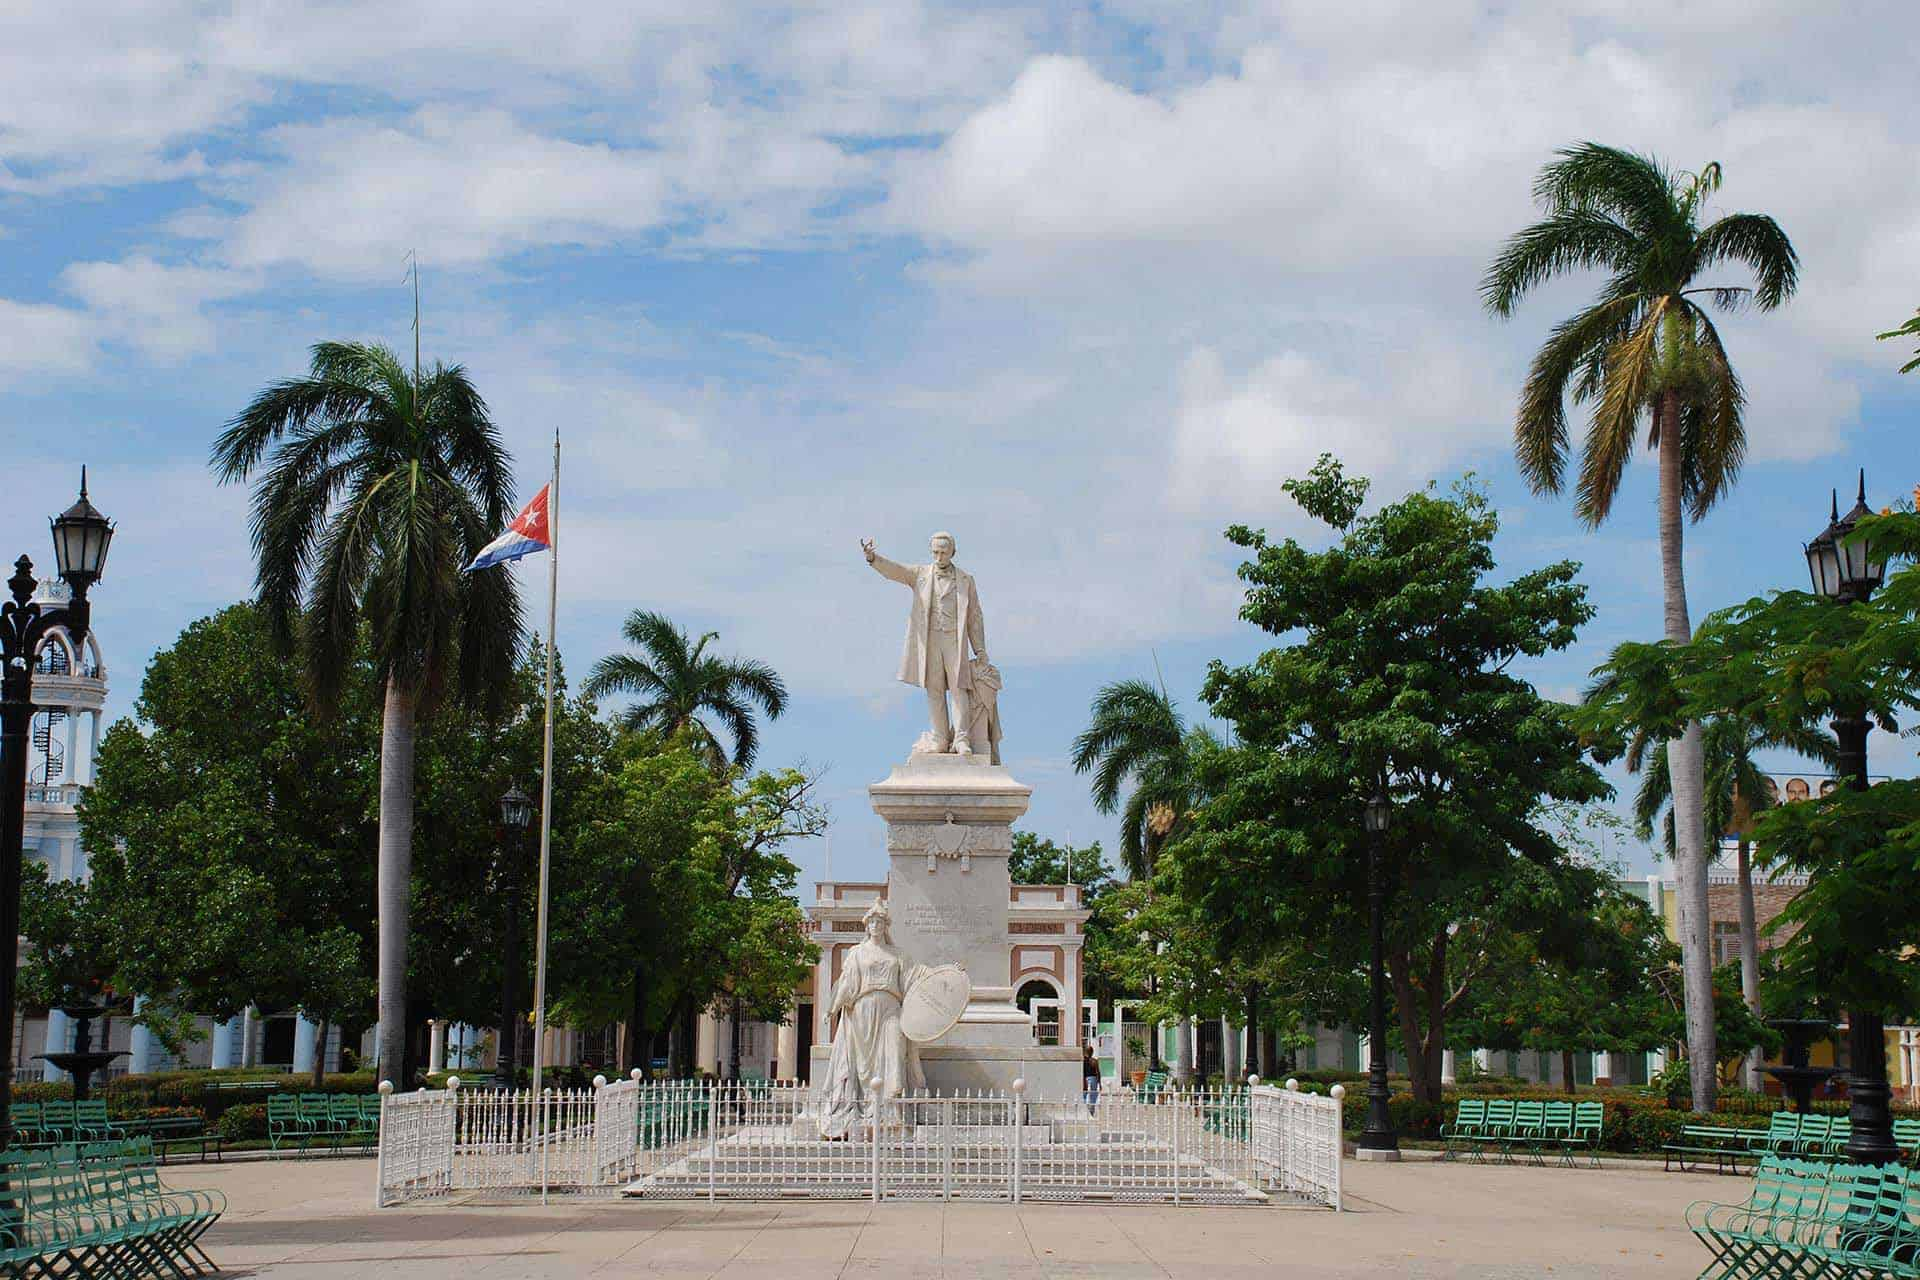 cienfuegos parc jose marti cuba autrement